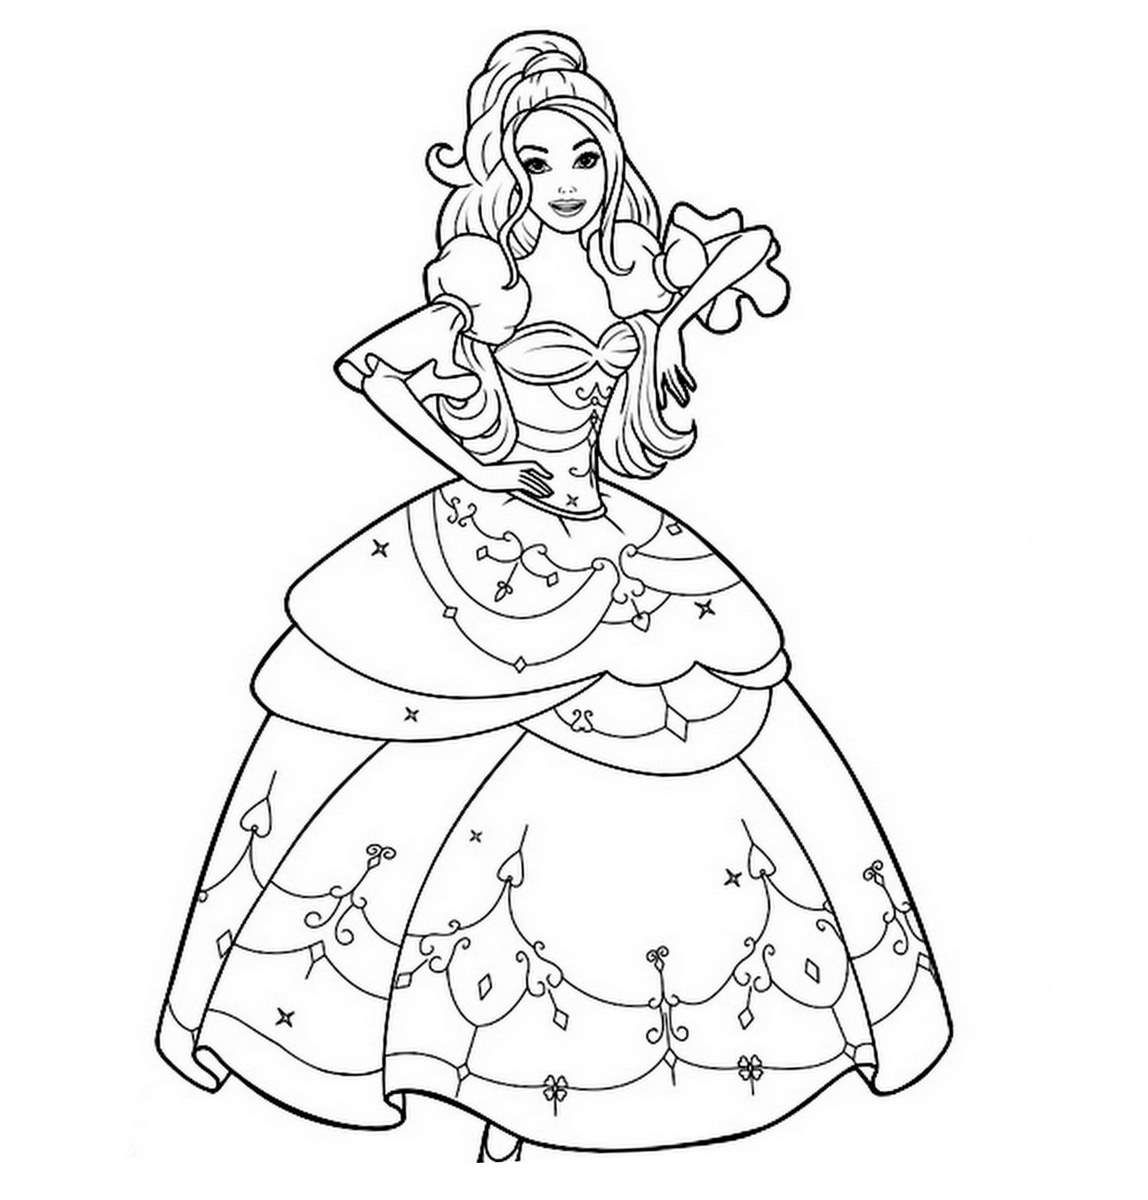 imprimer le coloriage princesse numro 4311